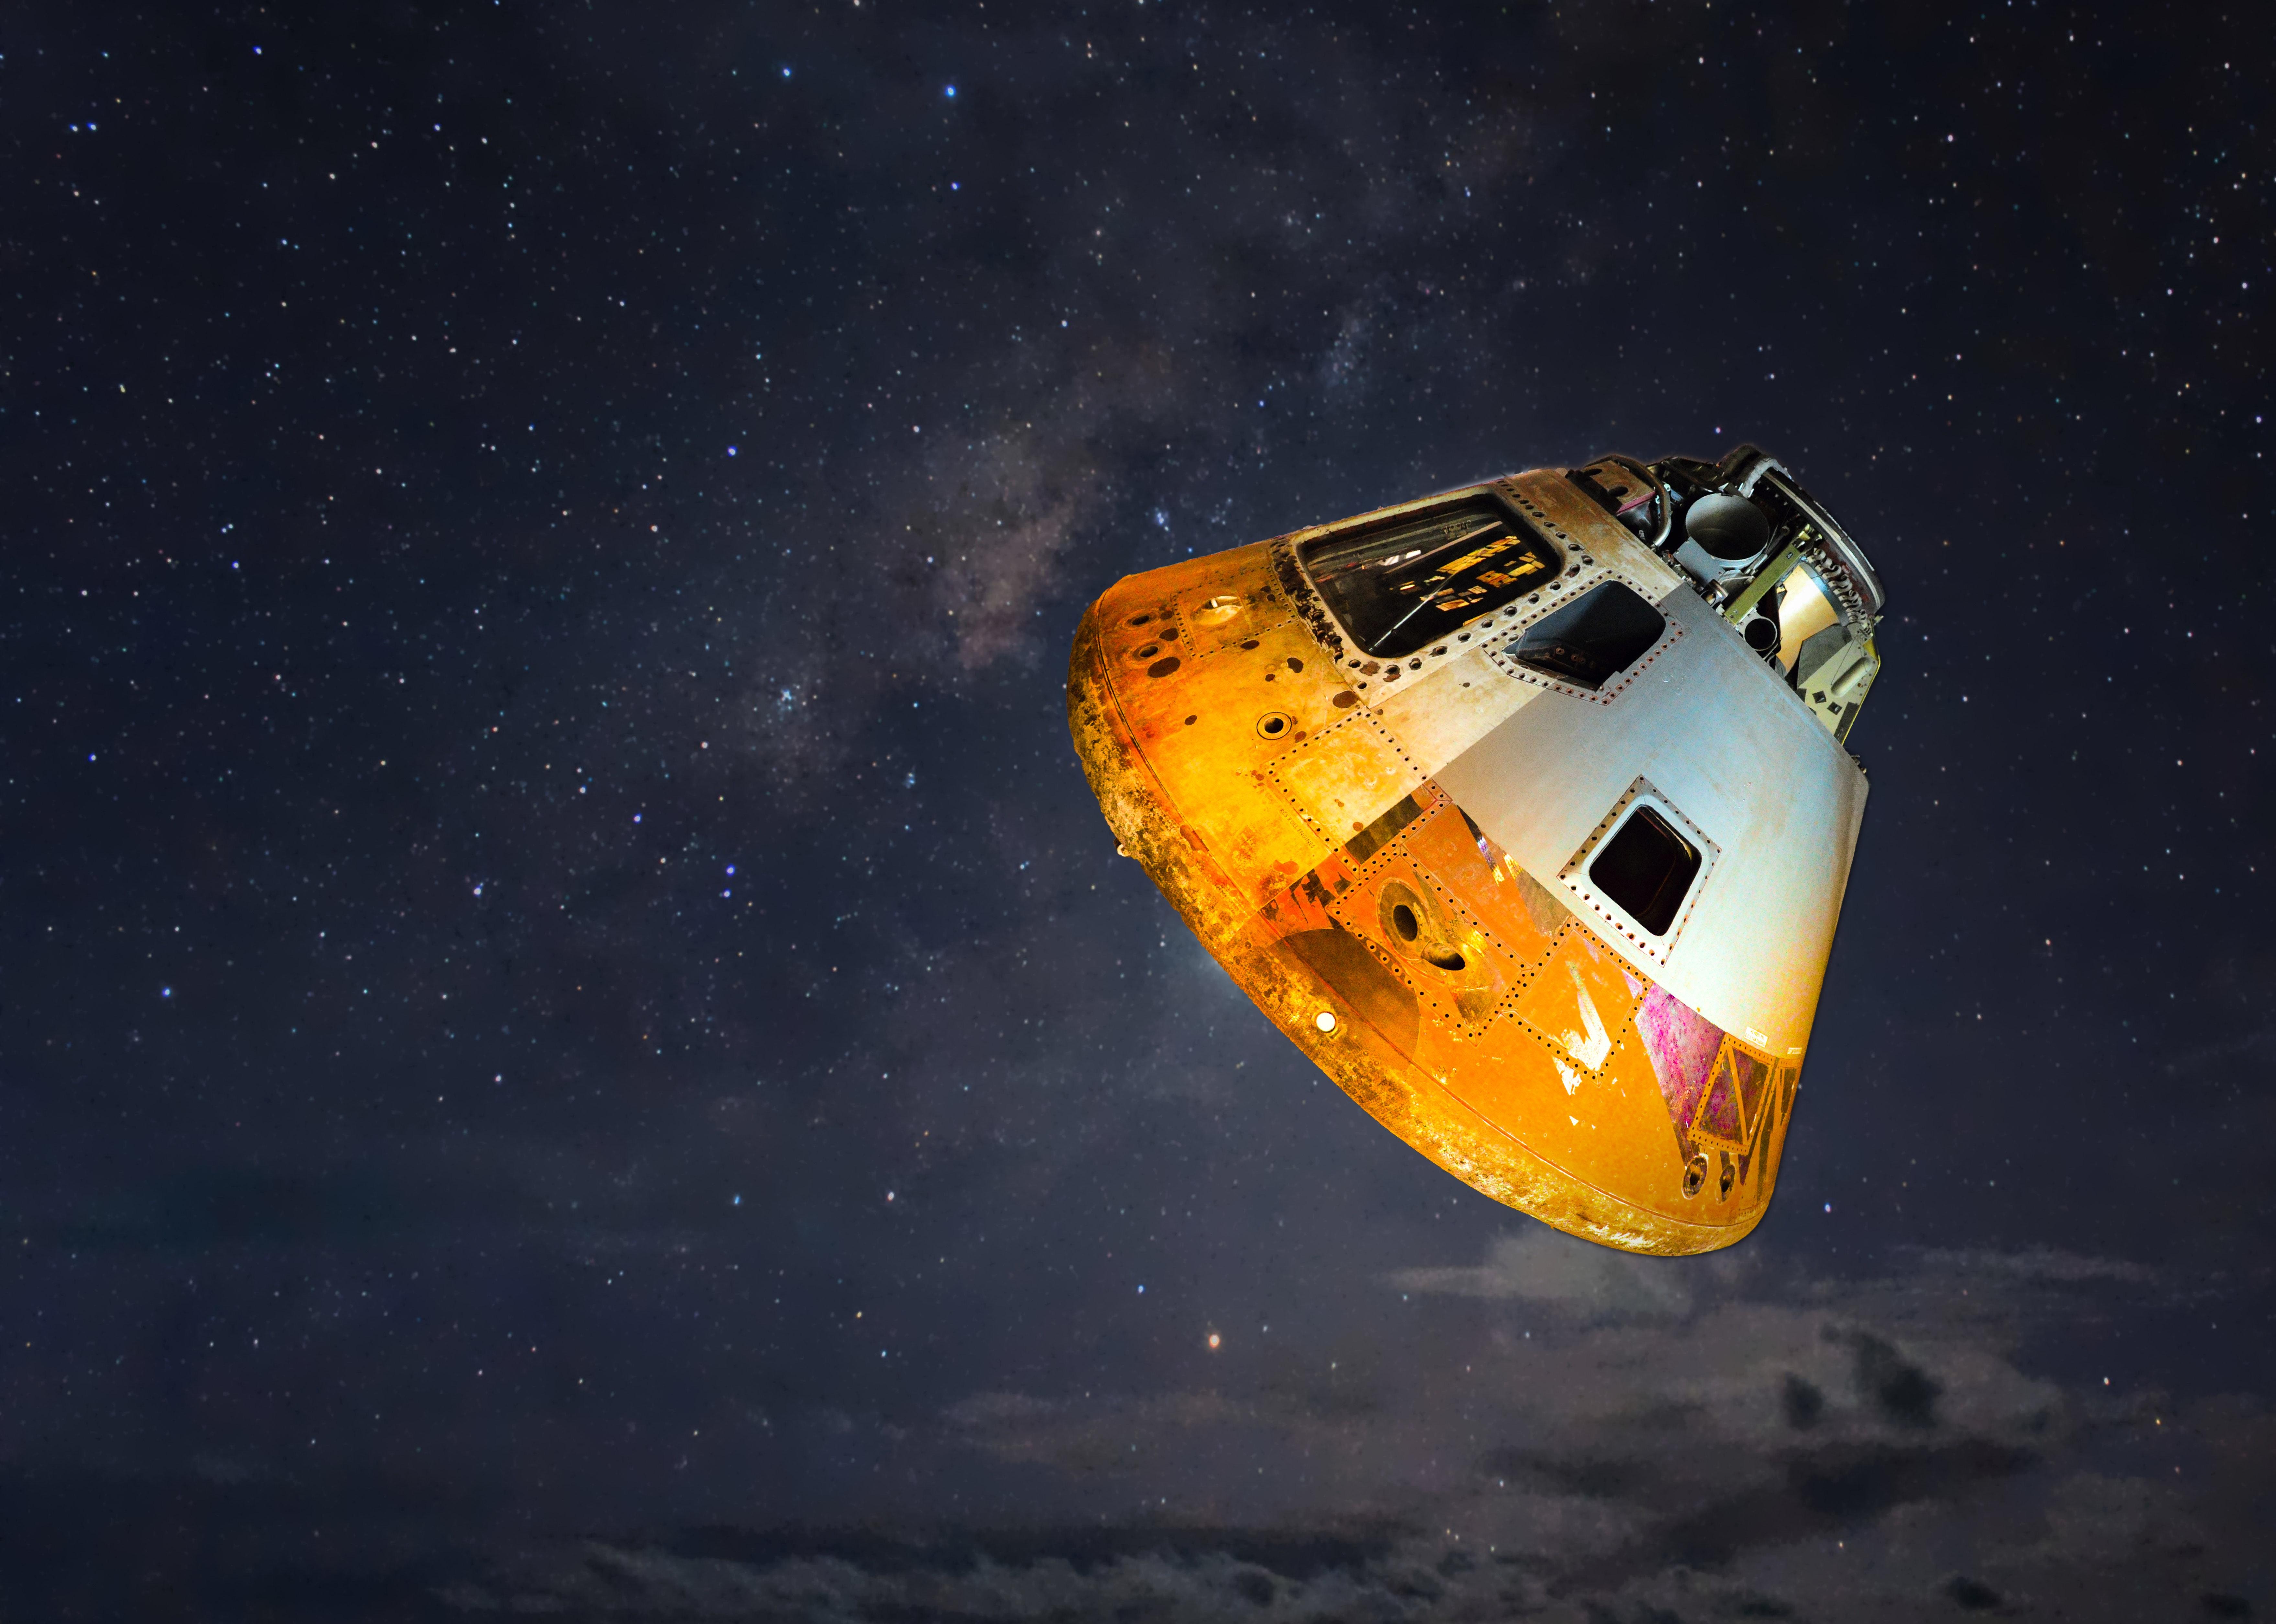 grey-and-orange-spaceship-700015